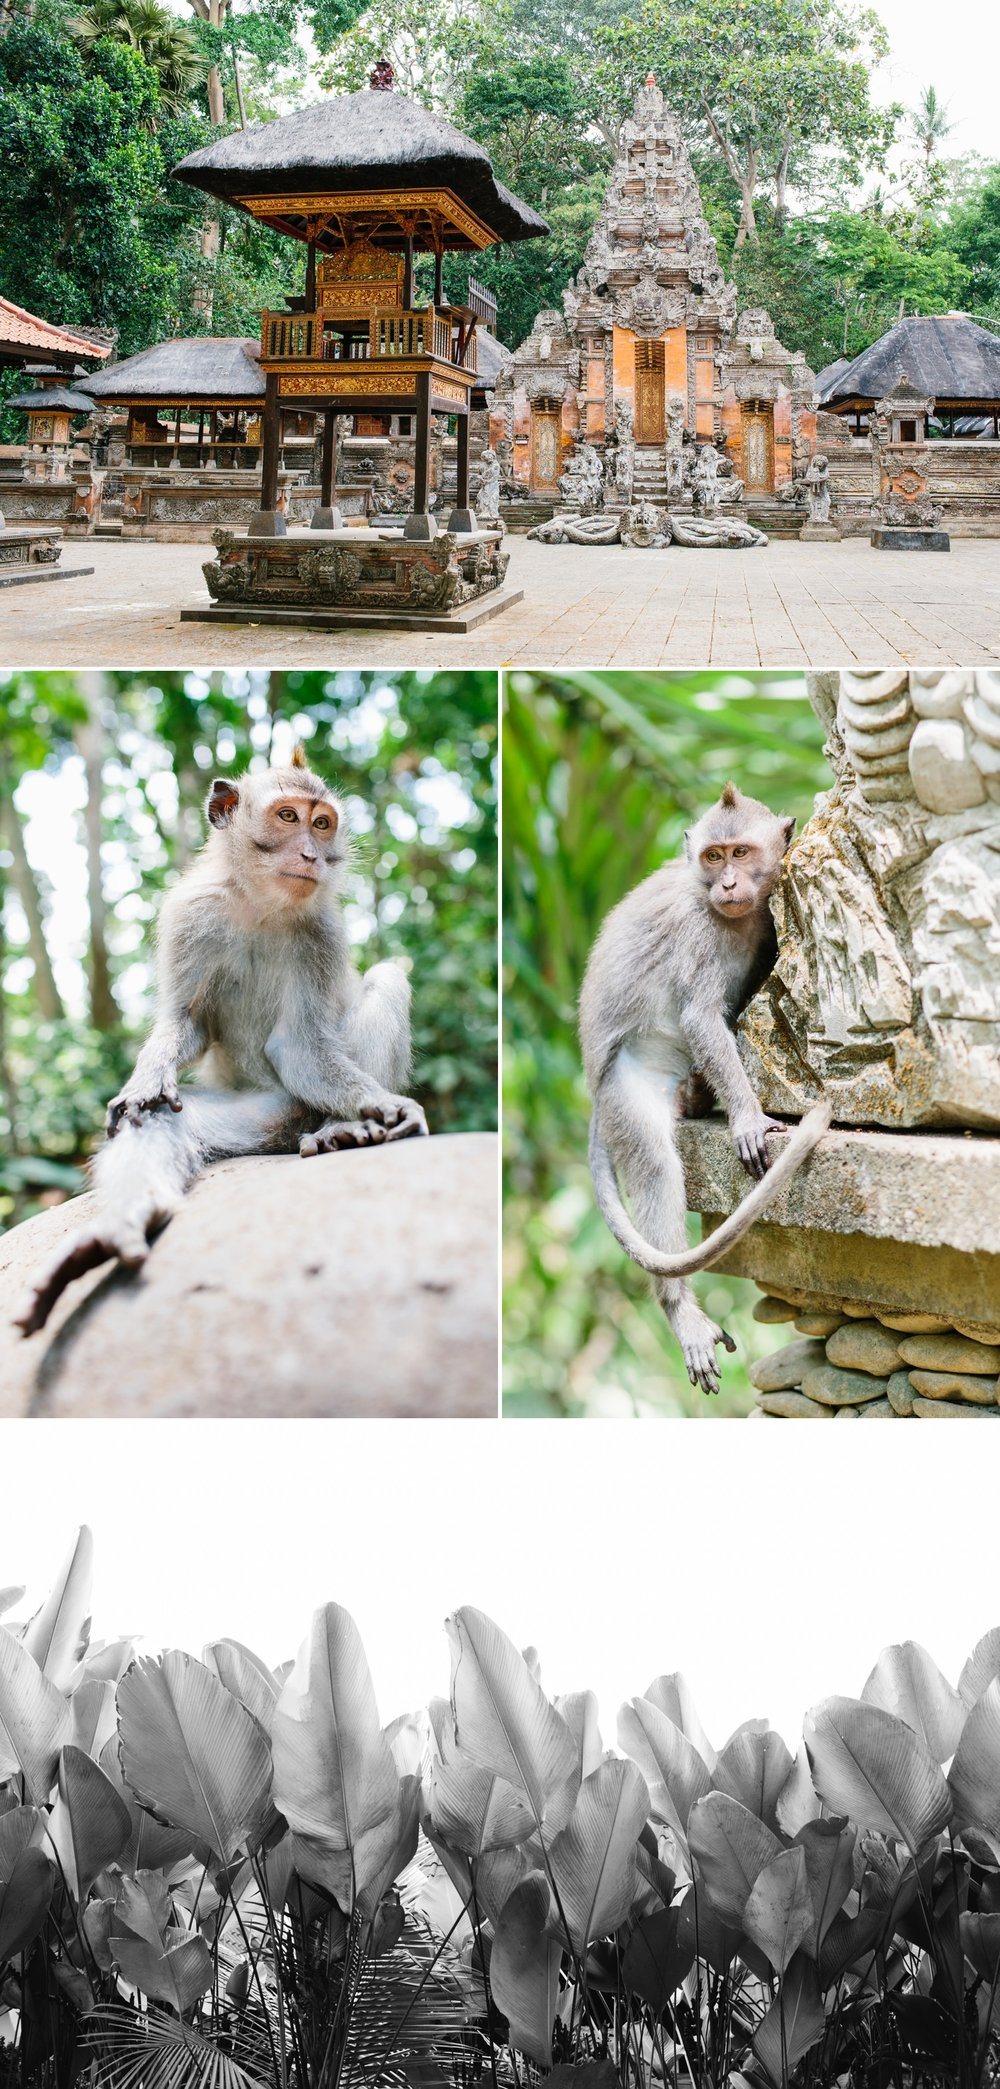 cameron-zegers-seattle-travel-photographer-bali-indonesia_0022.jpg